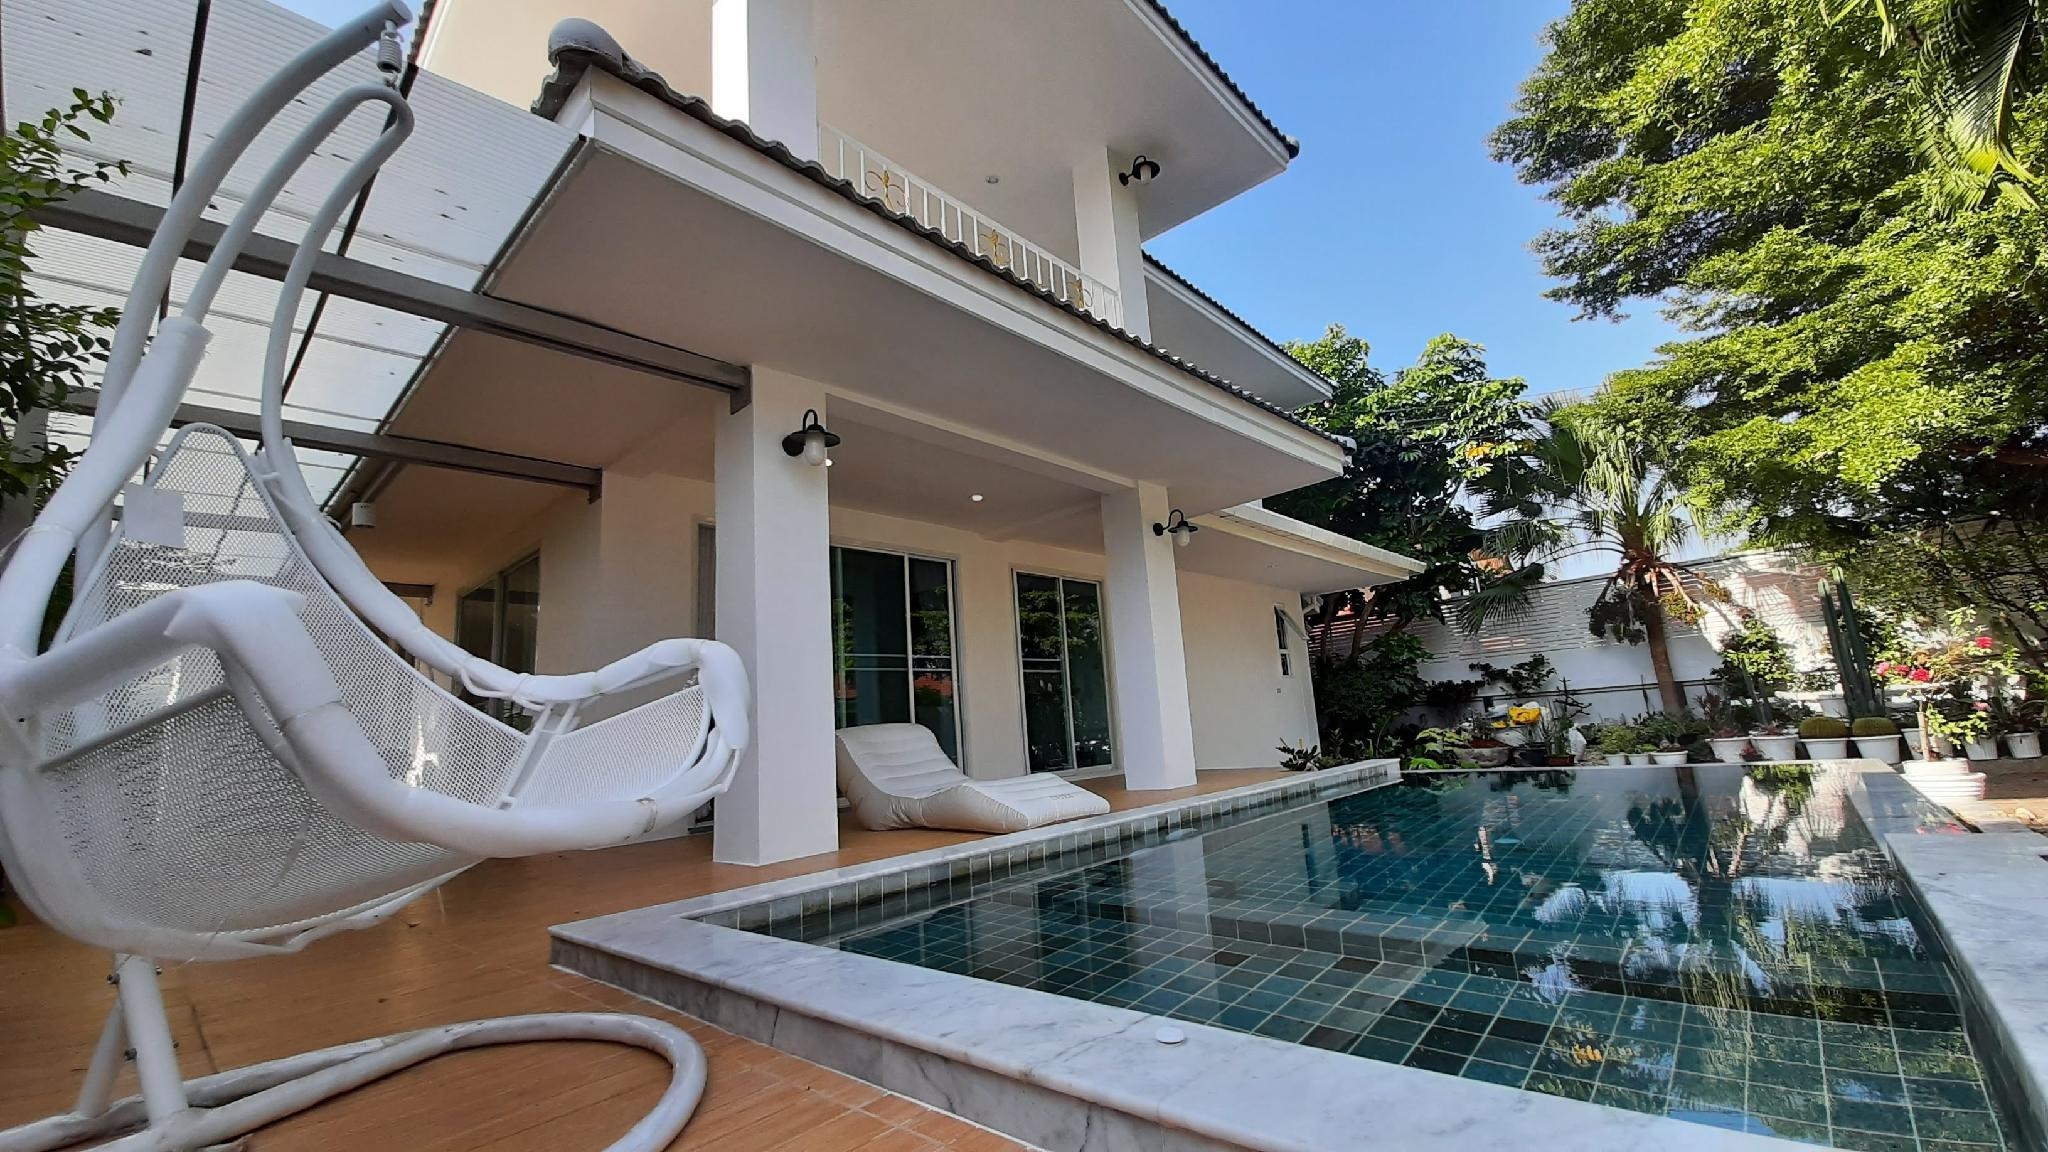 Family Villa w Saltwater & Kids Pool วิลลา 4 ห้องนอน 4 ห้องน้ำส่วนตัว ขนาด 400 ตร.ม. – สันทราย